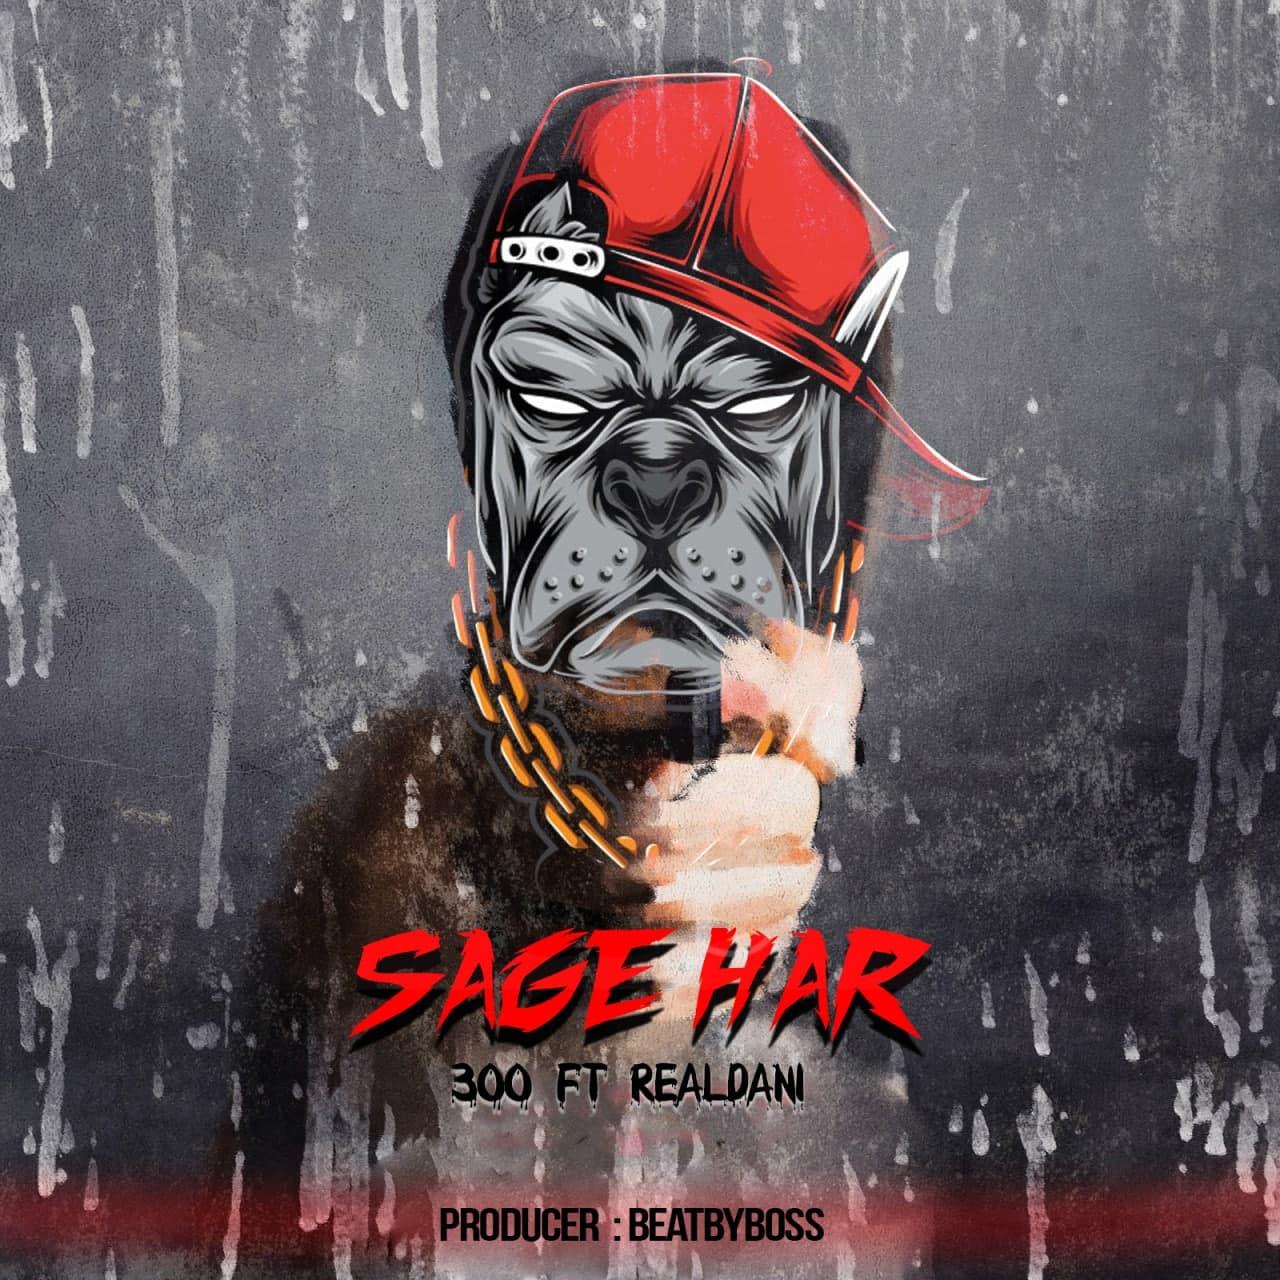 300 Ft Realdani - Sage Har